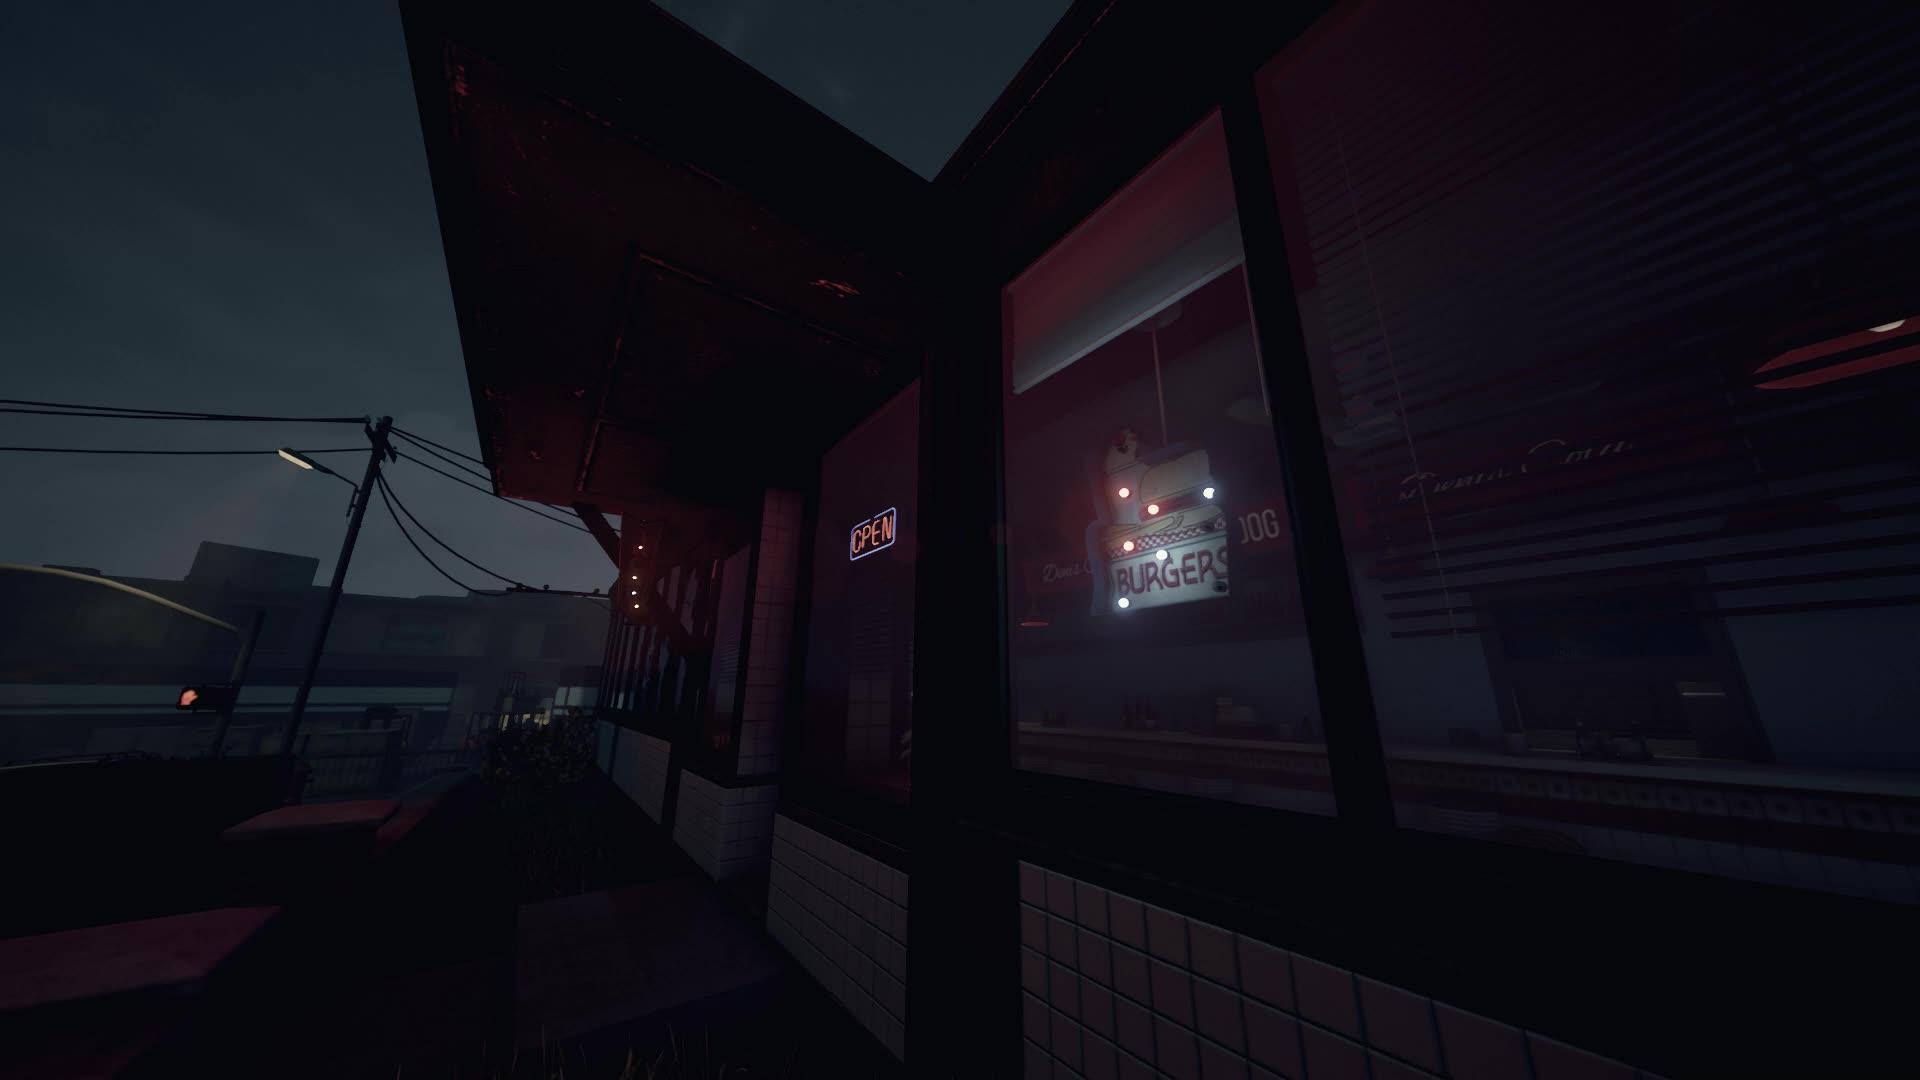 Cafe.Lights, Husk, night, Cafe GIFs